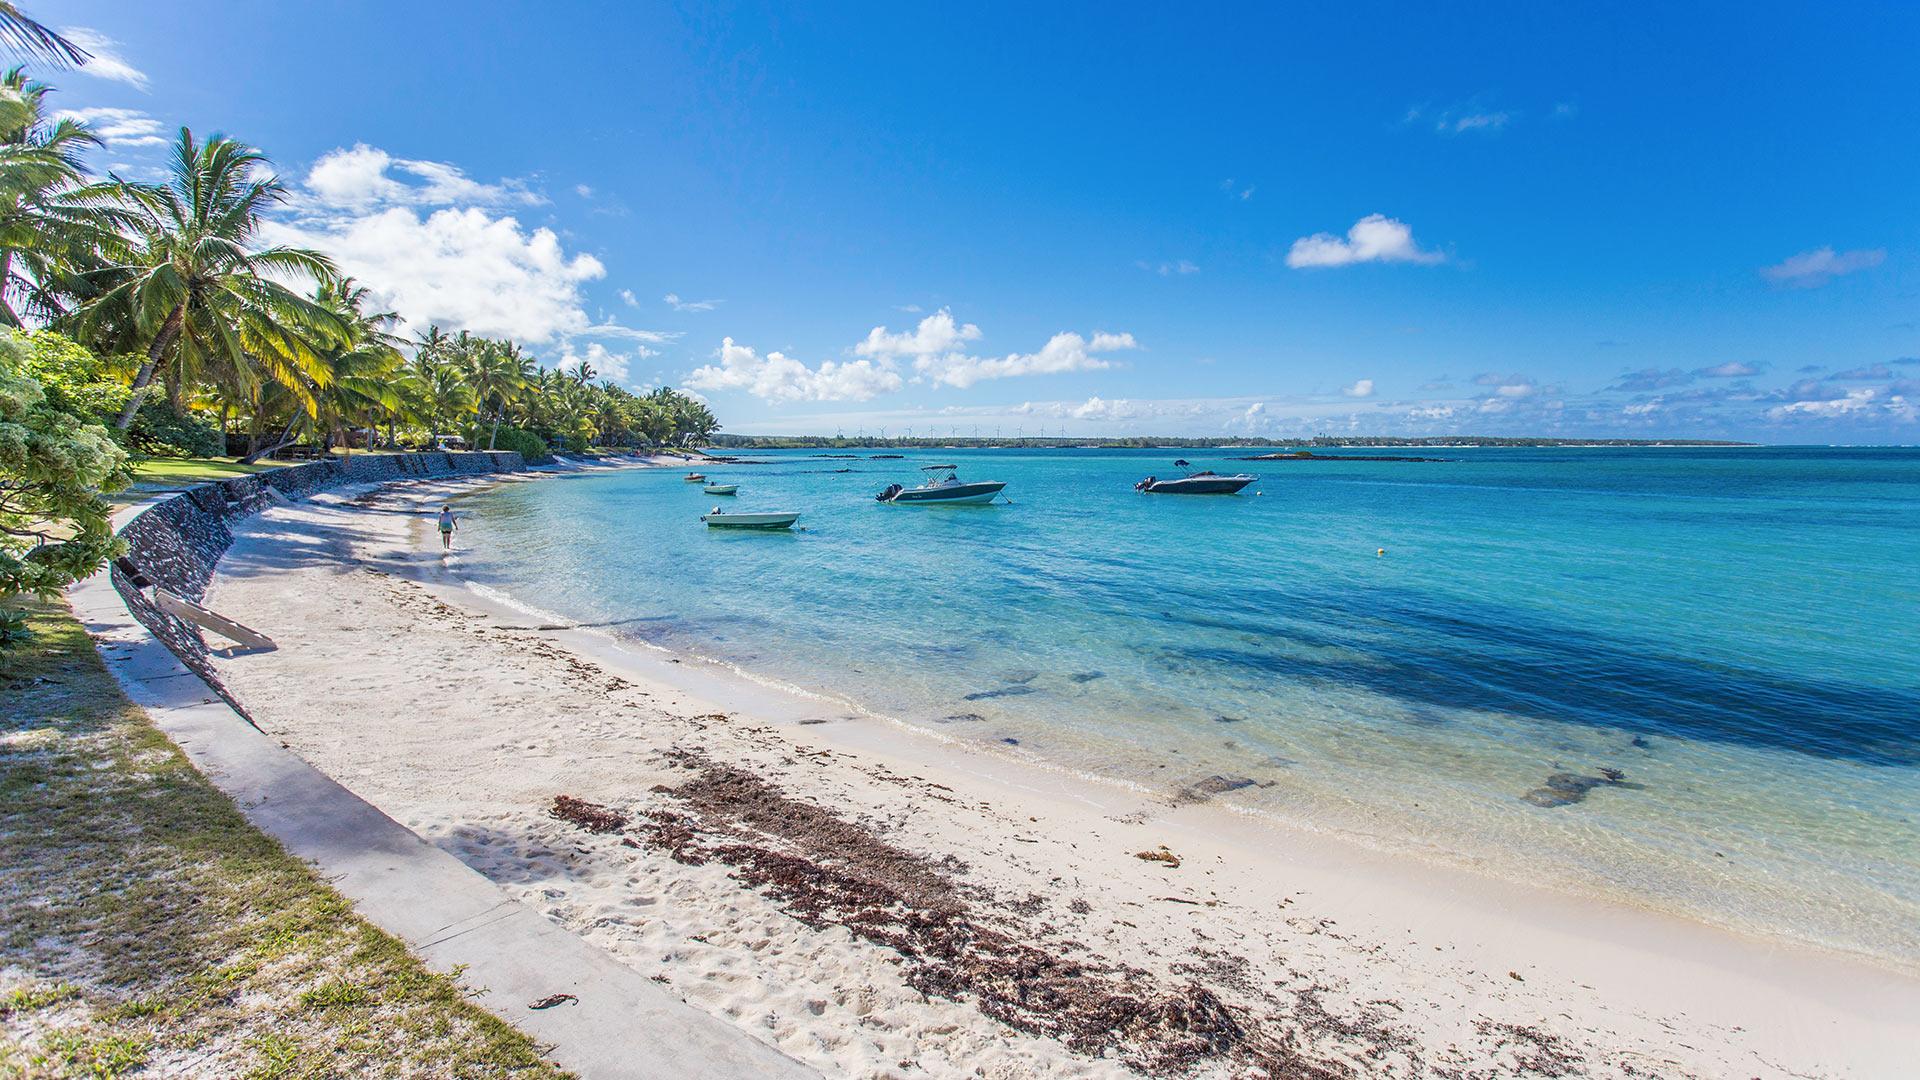 Villa Villa Corail Mauritius, Rental in Mauritius East